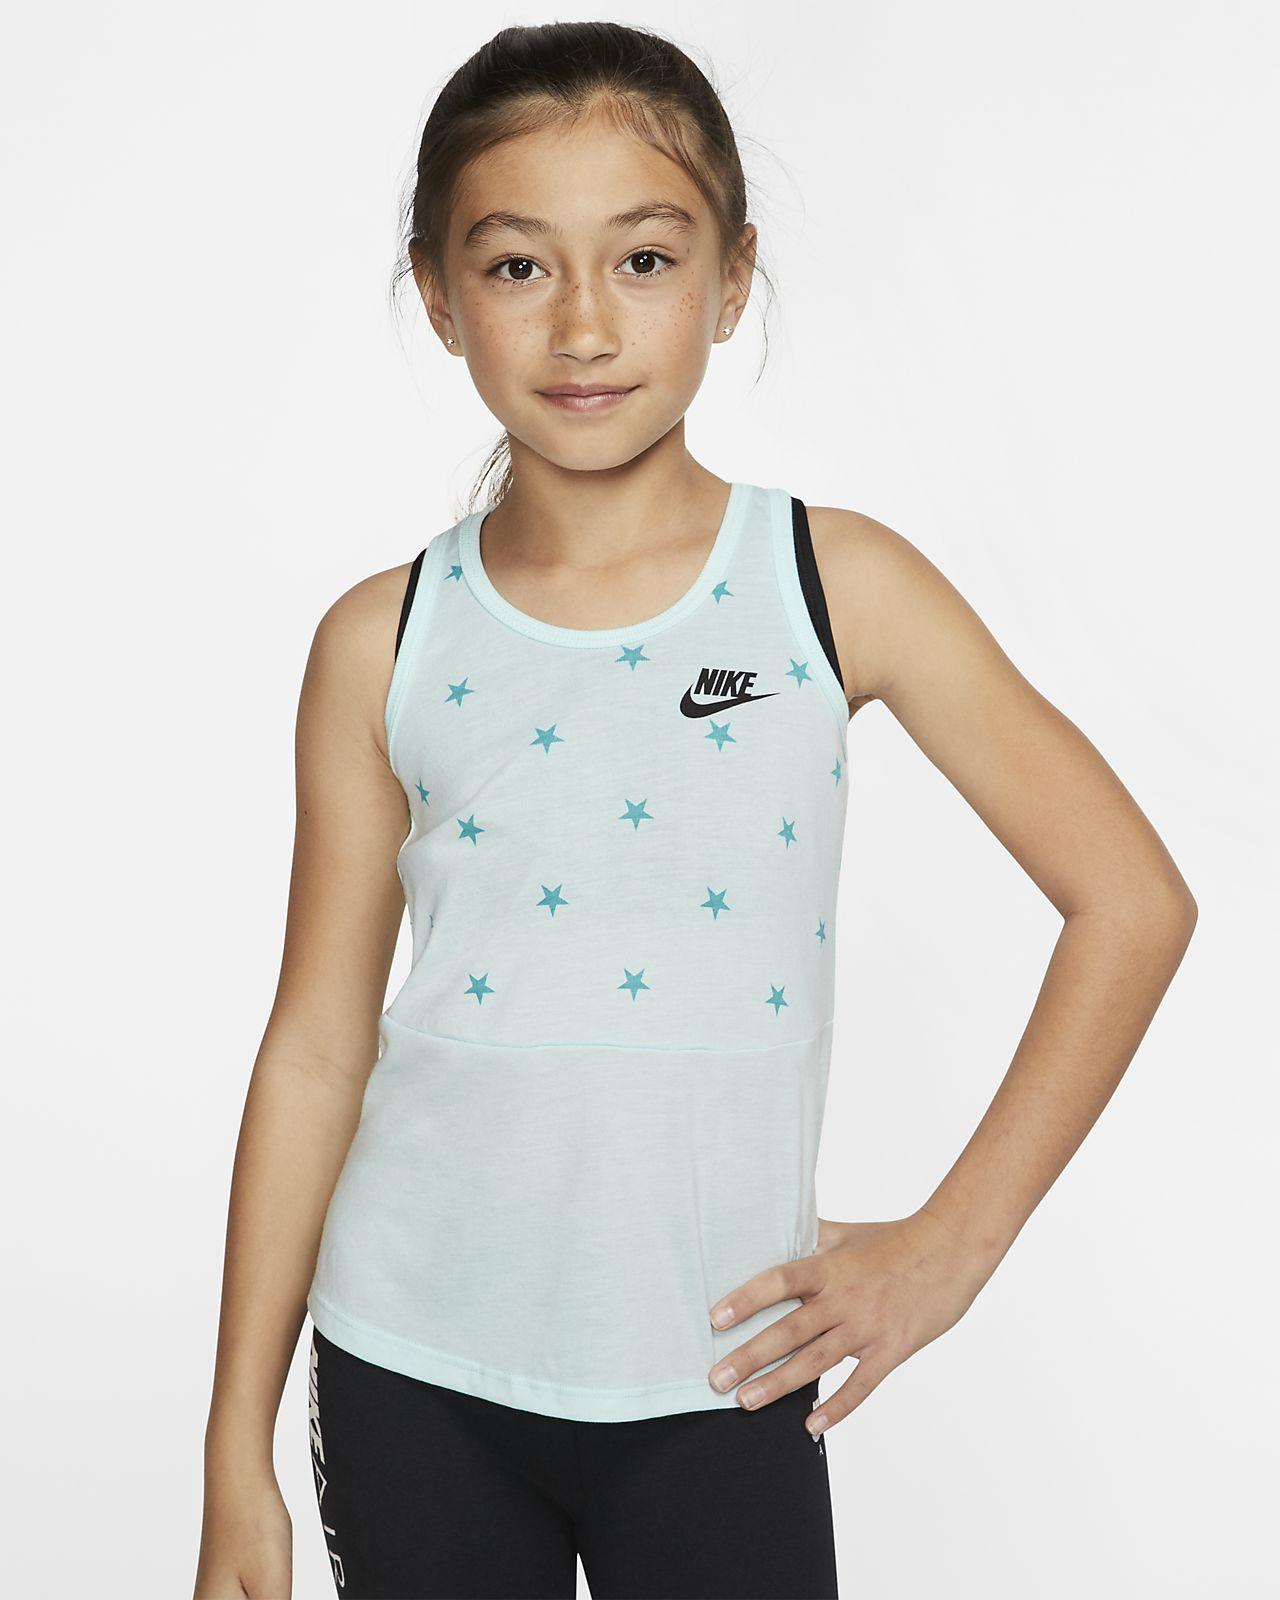 e6c2b2c6a90ab Nike Sportswear Little Kids  Sleeveless Printed Top. Nike.com